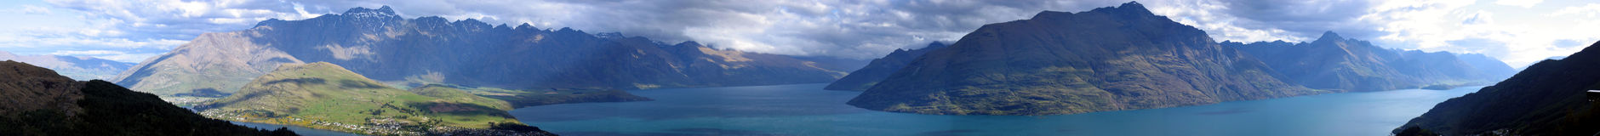 panorama remarkables góry Zdjęcia Stock